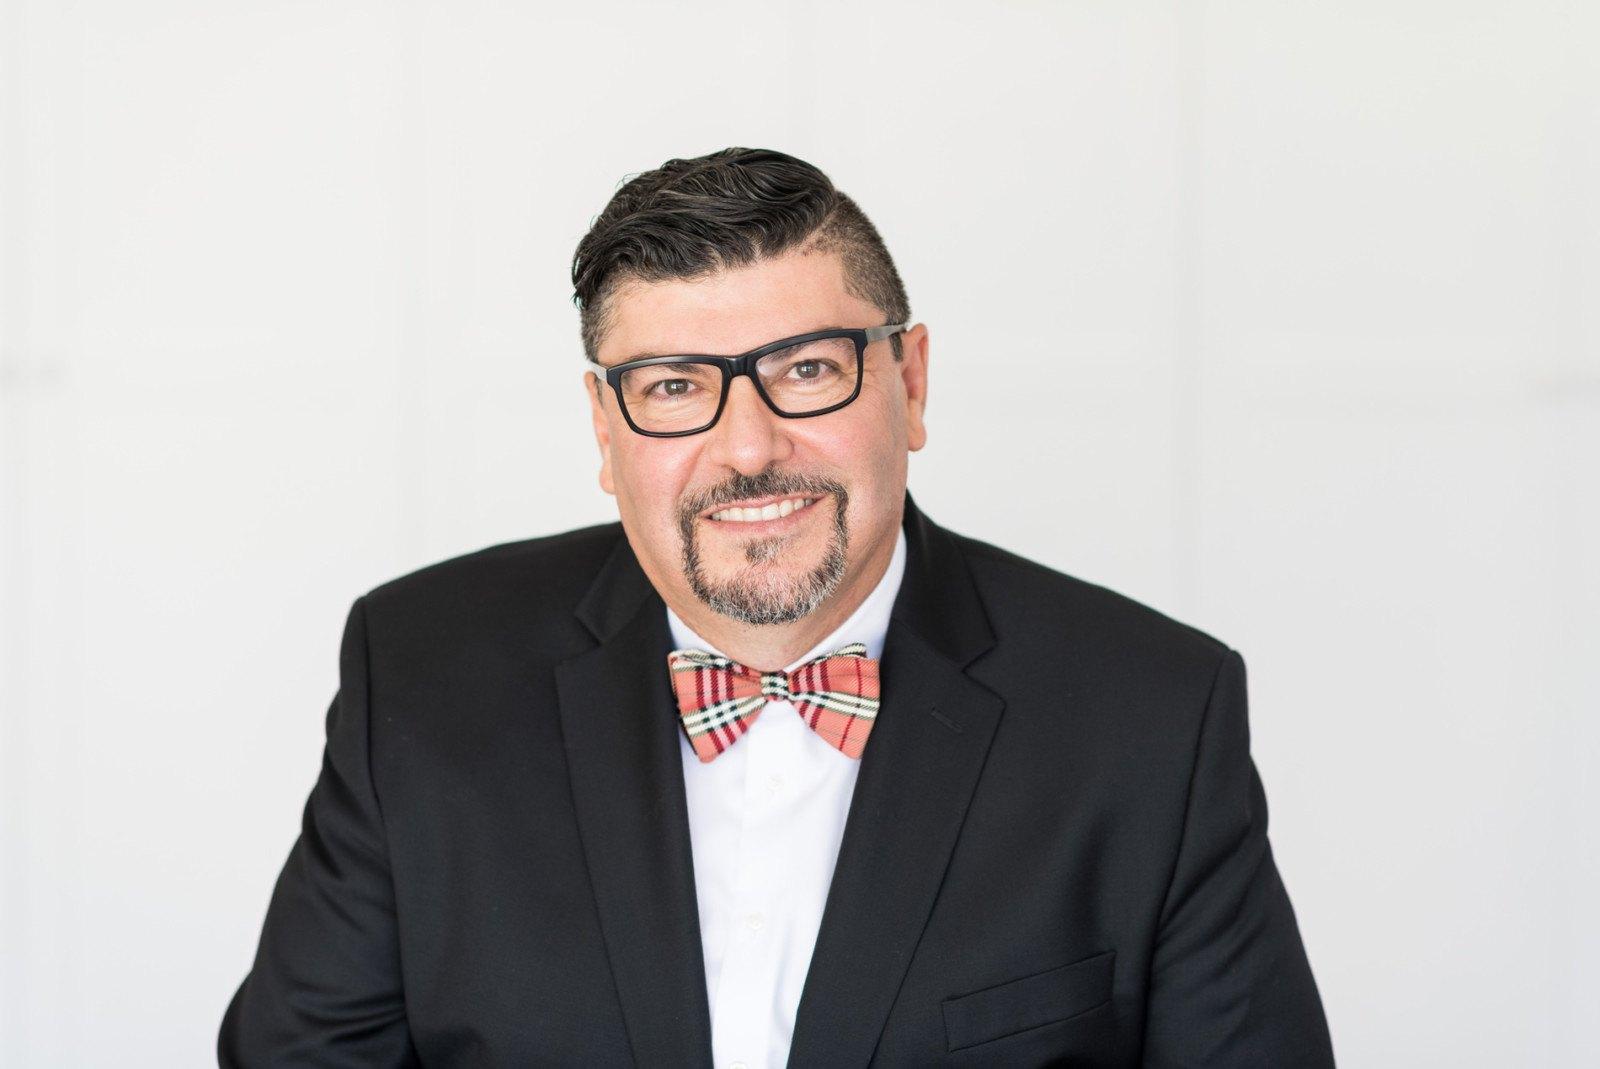 Enrique Ceniceros